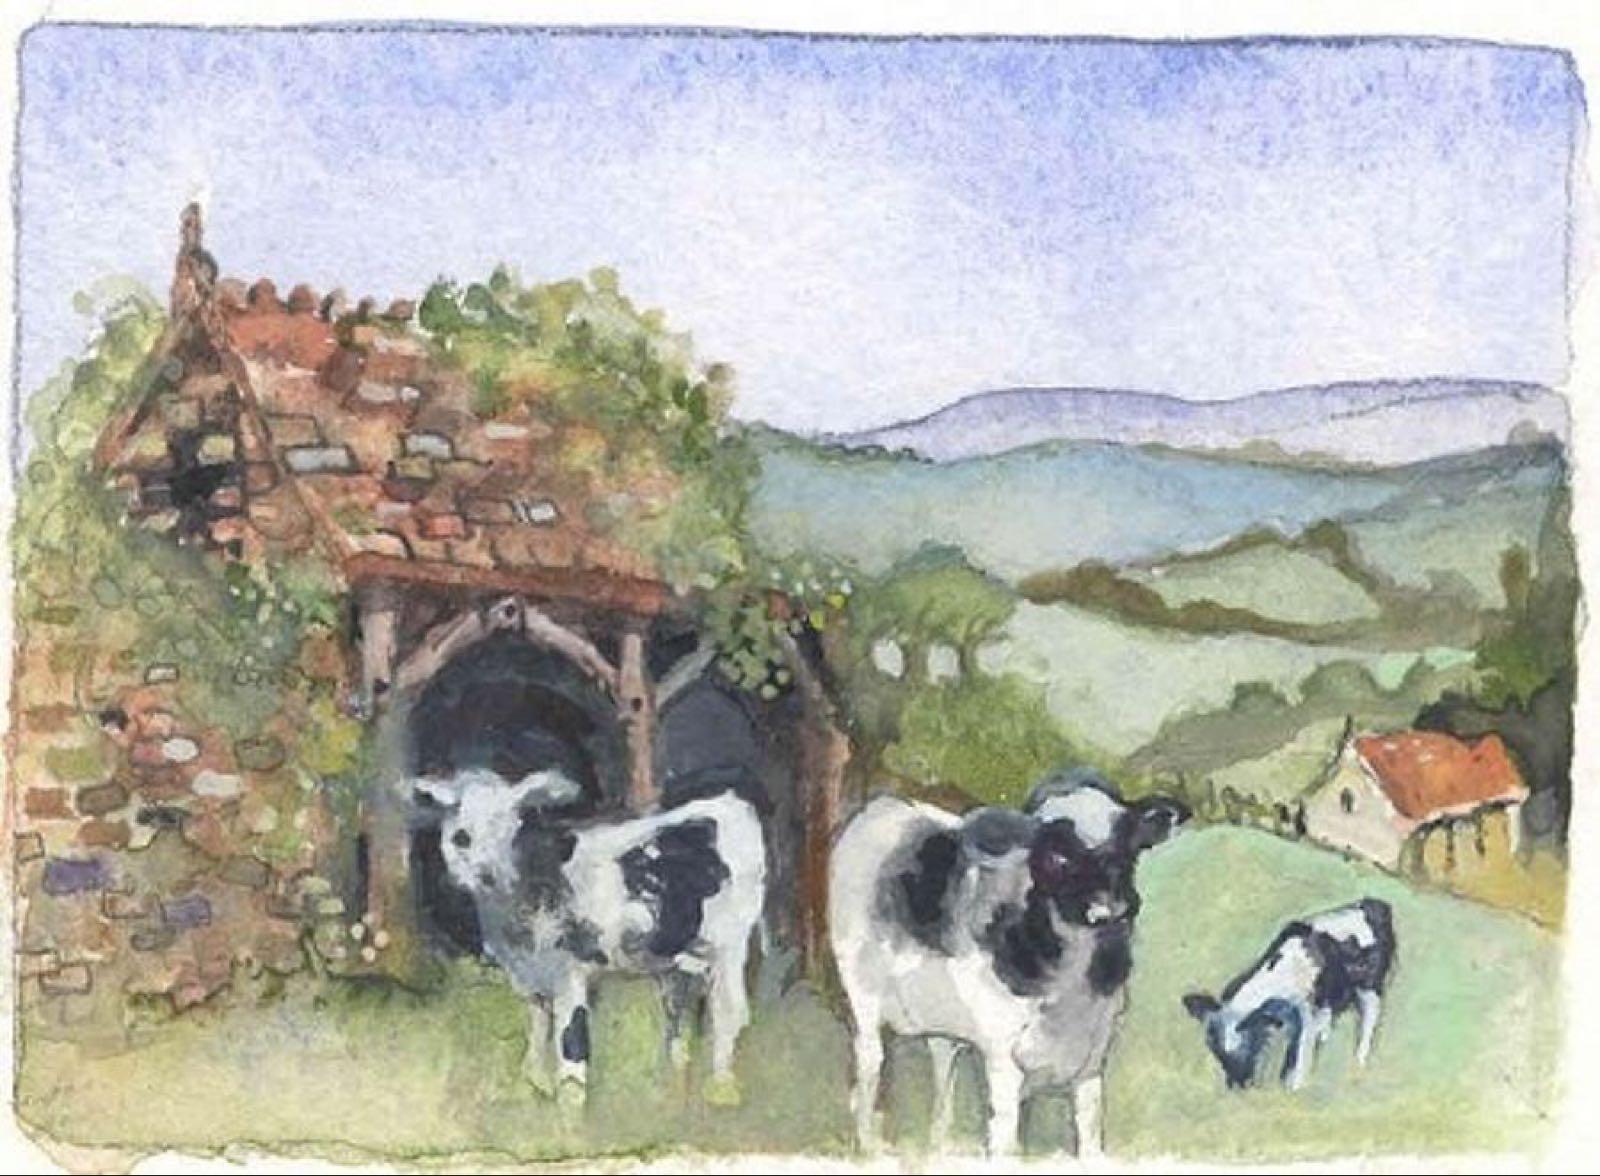 'Inquisitive Calves' Furzedown Gallery Mini Card